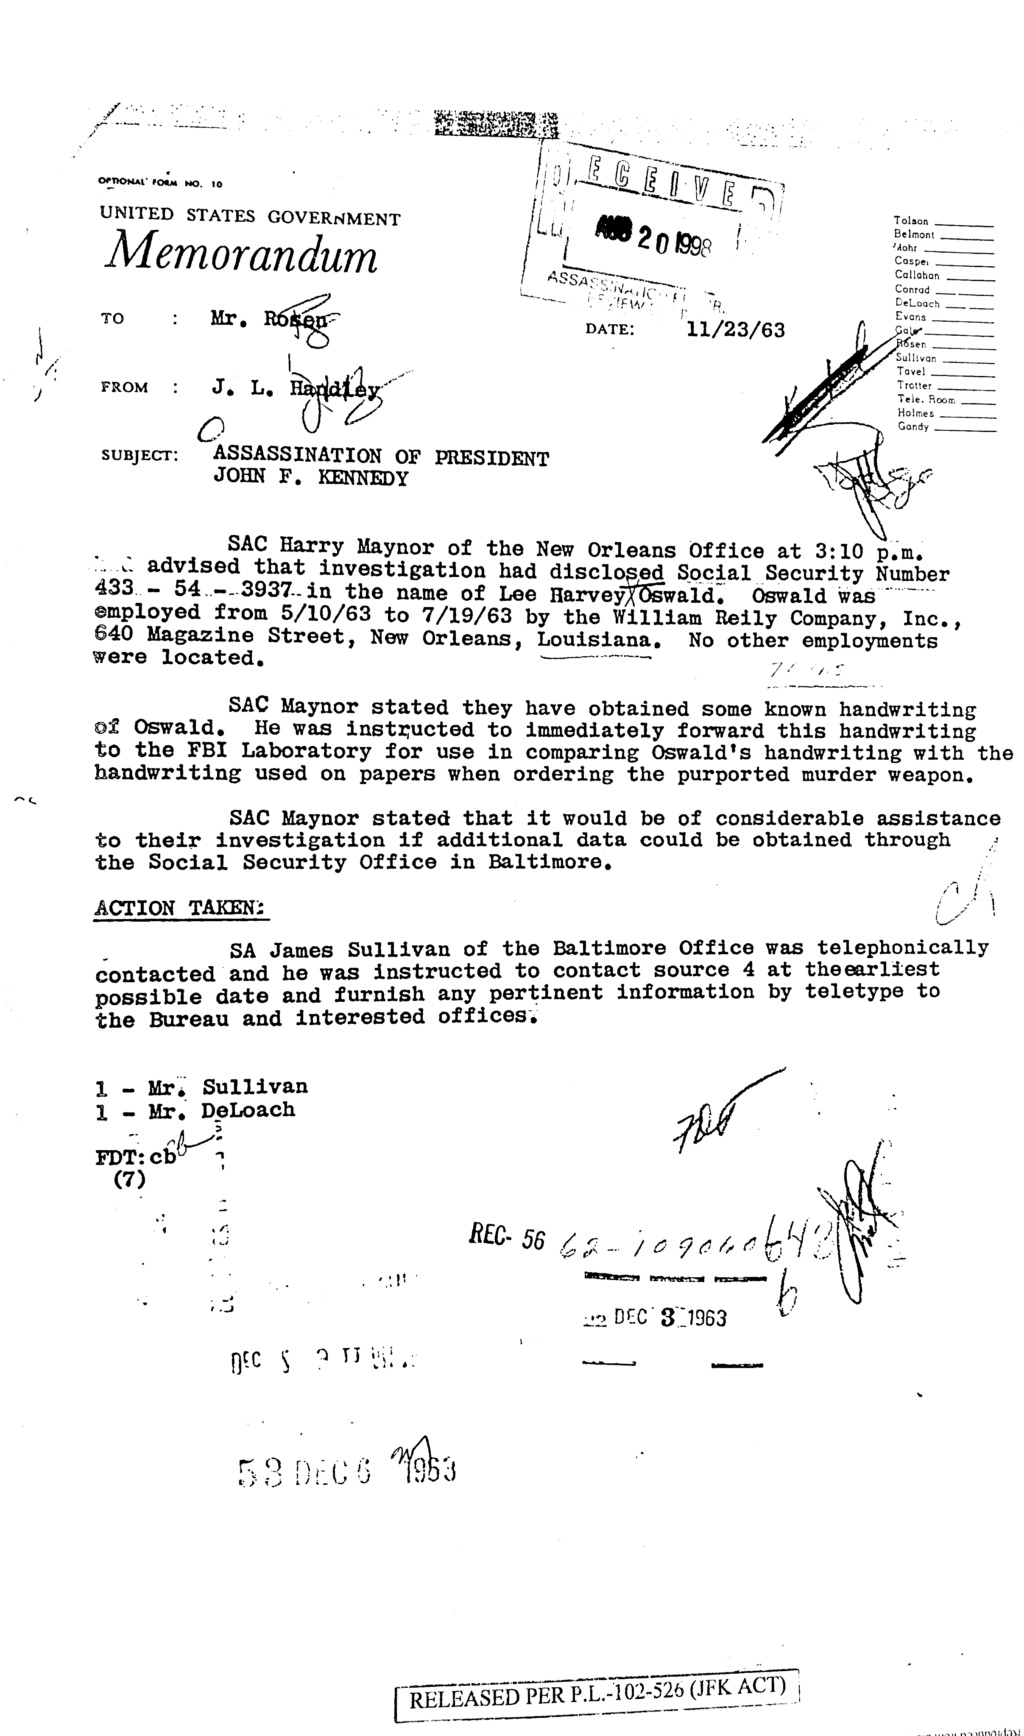 Lee Harvey Oswald Social Security No. Jun_1114